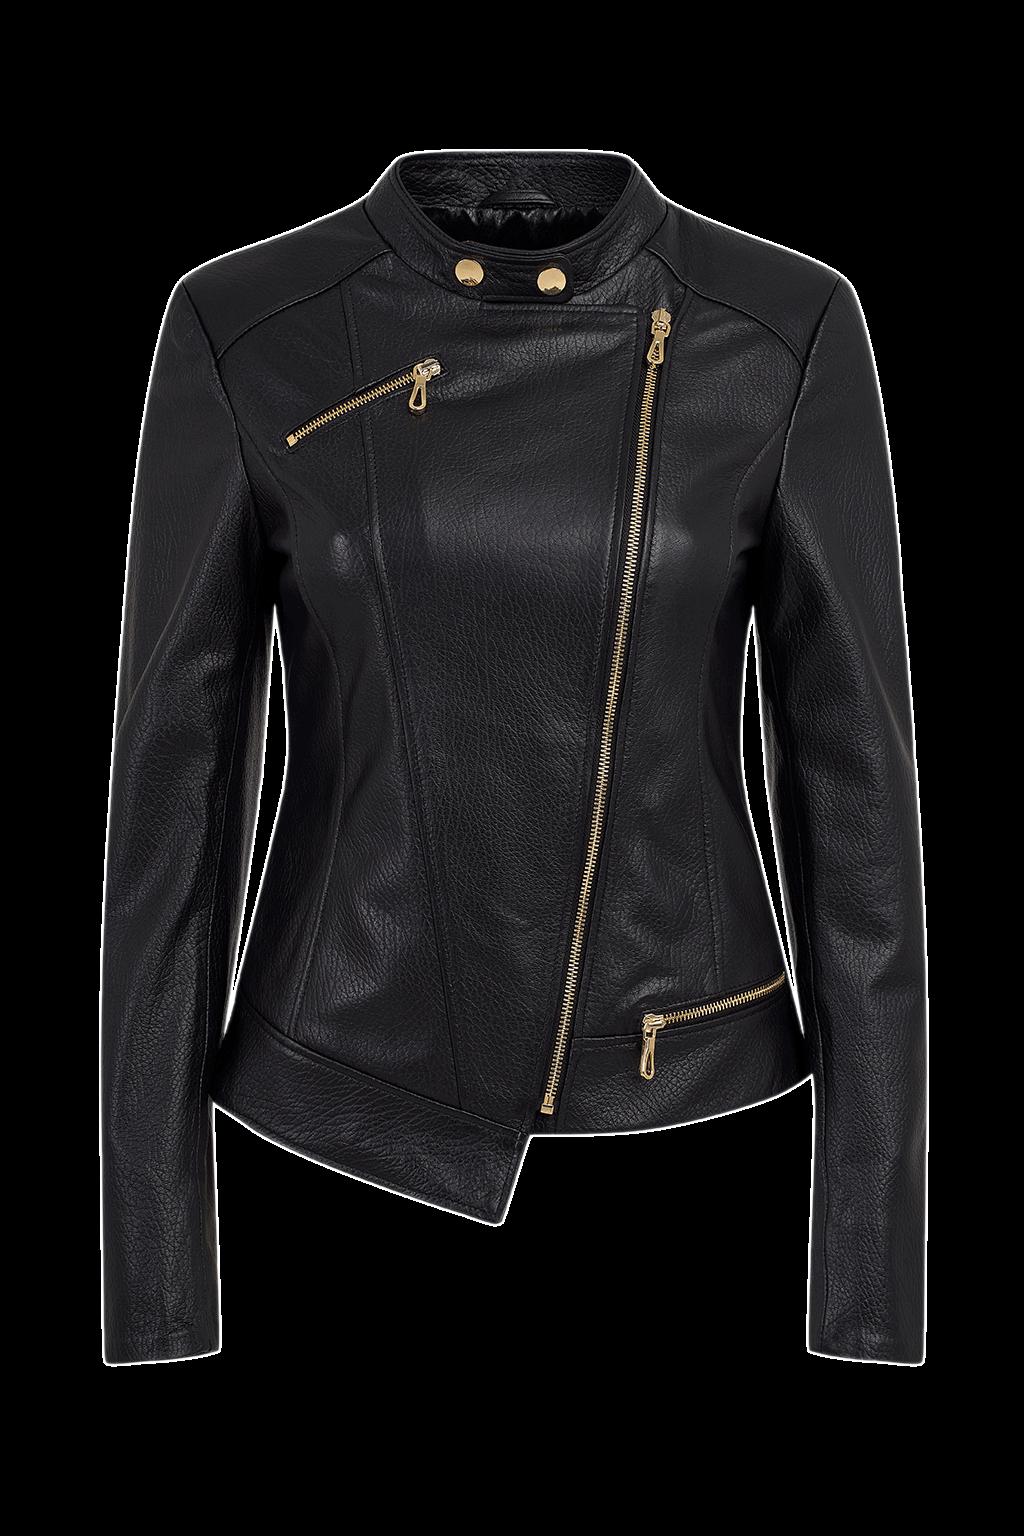 Women's Asymmetric Leather Jacket - Black